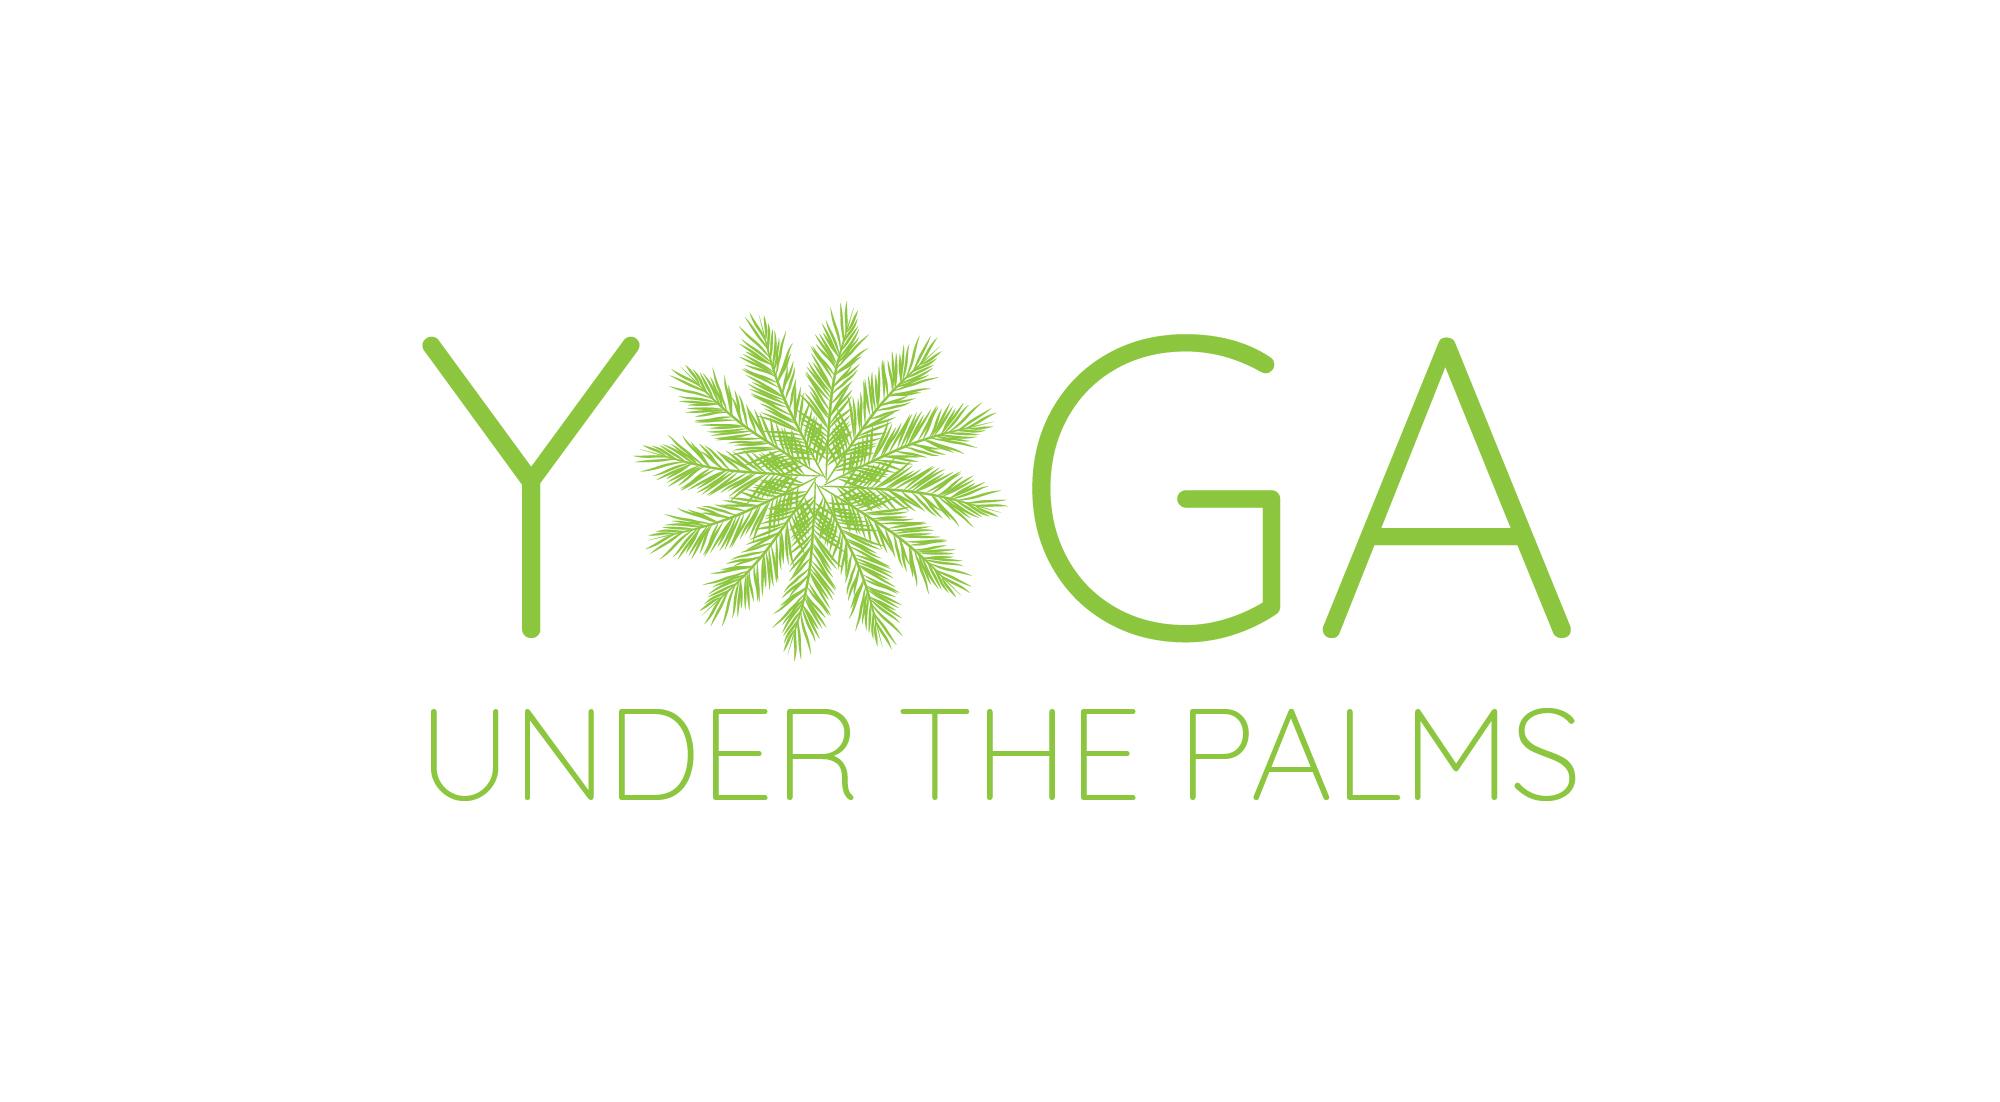 yoga under the palms logo